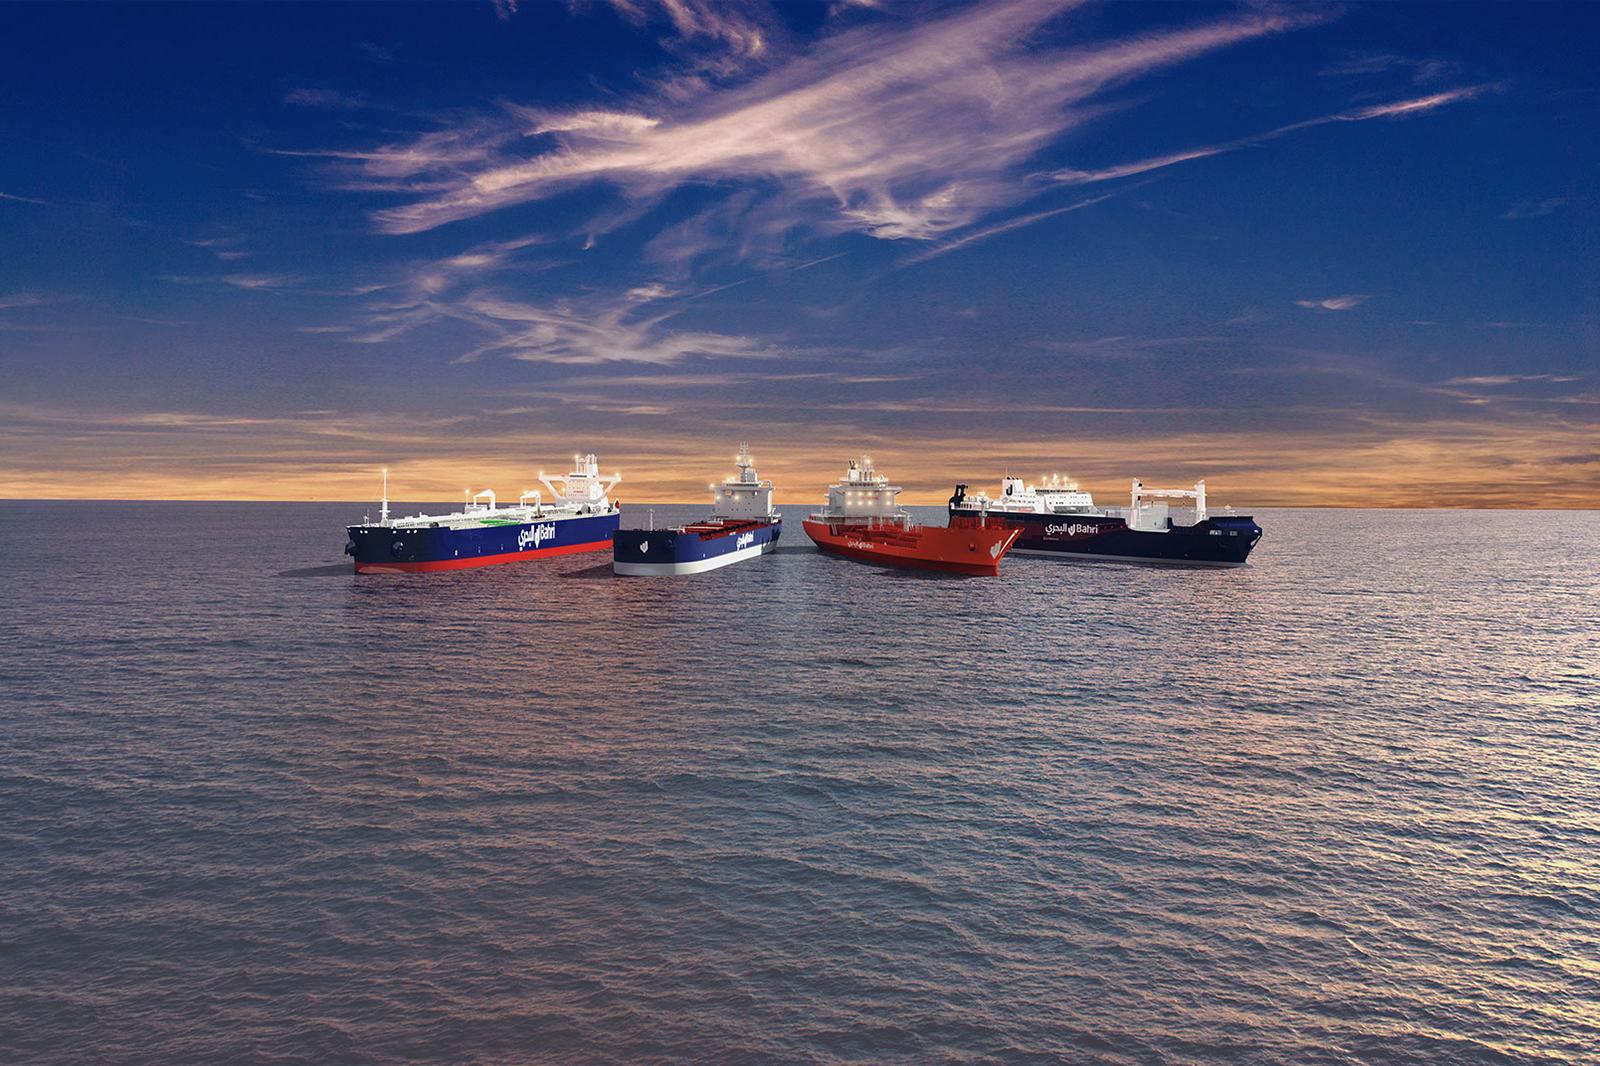 Bahri ships